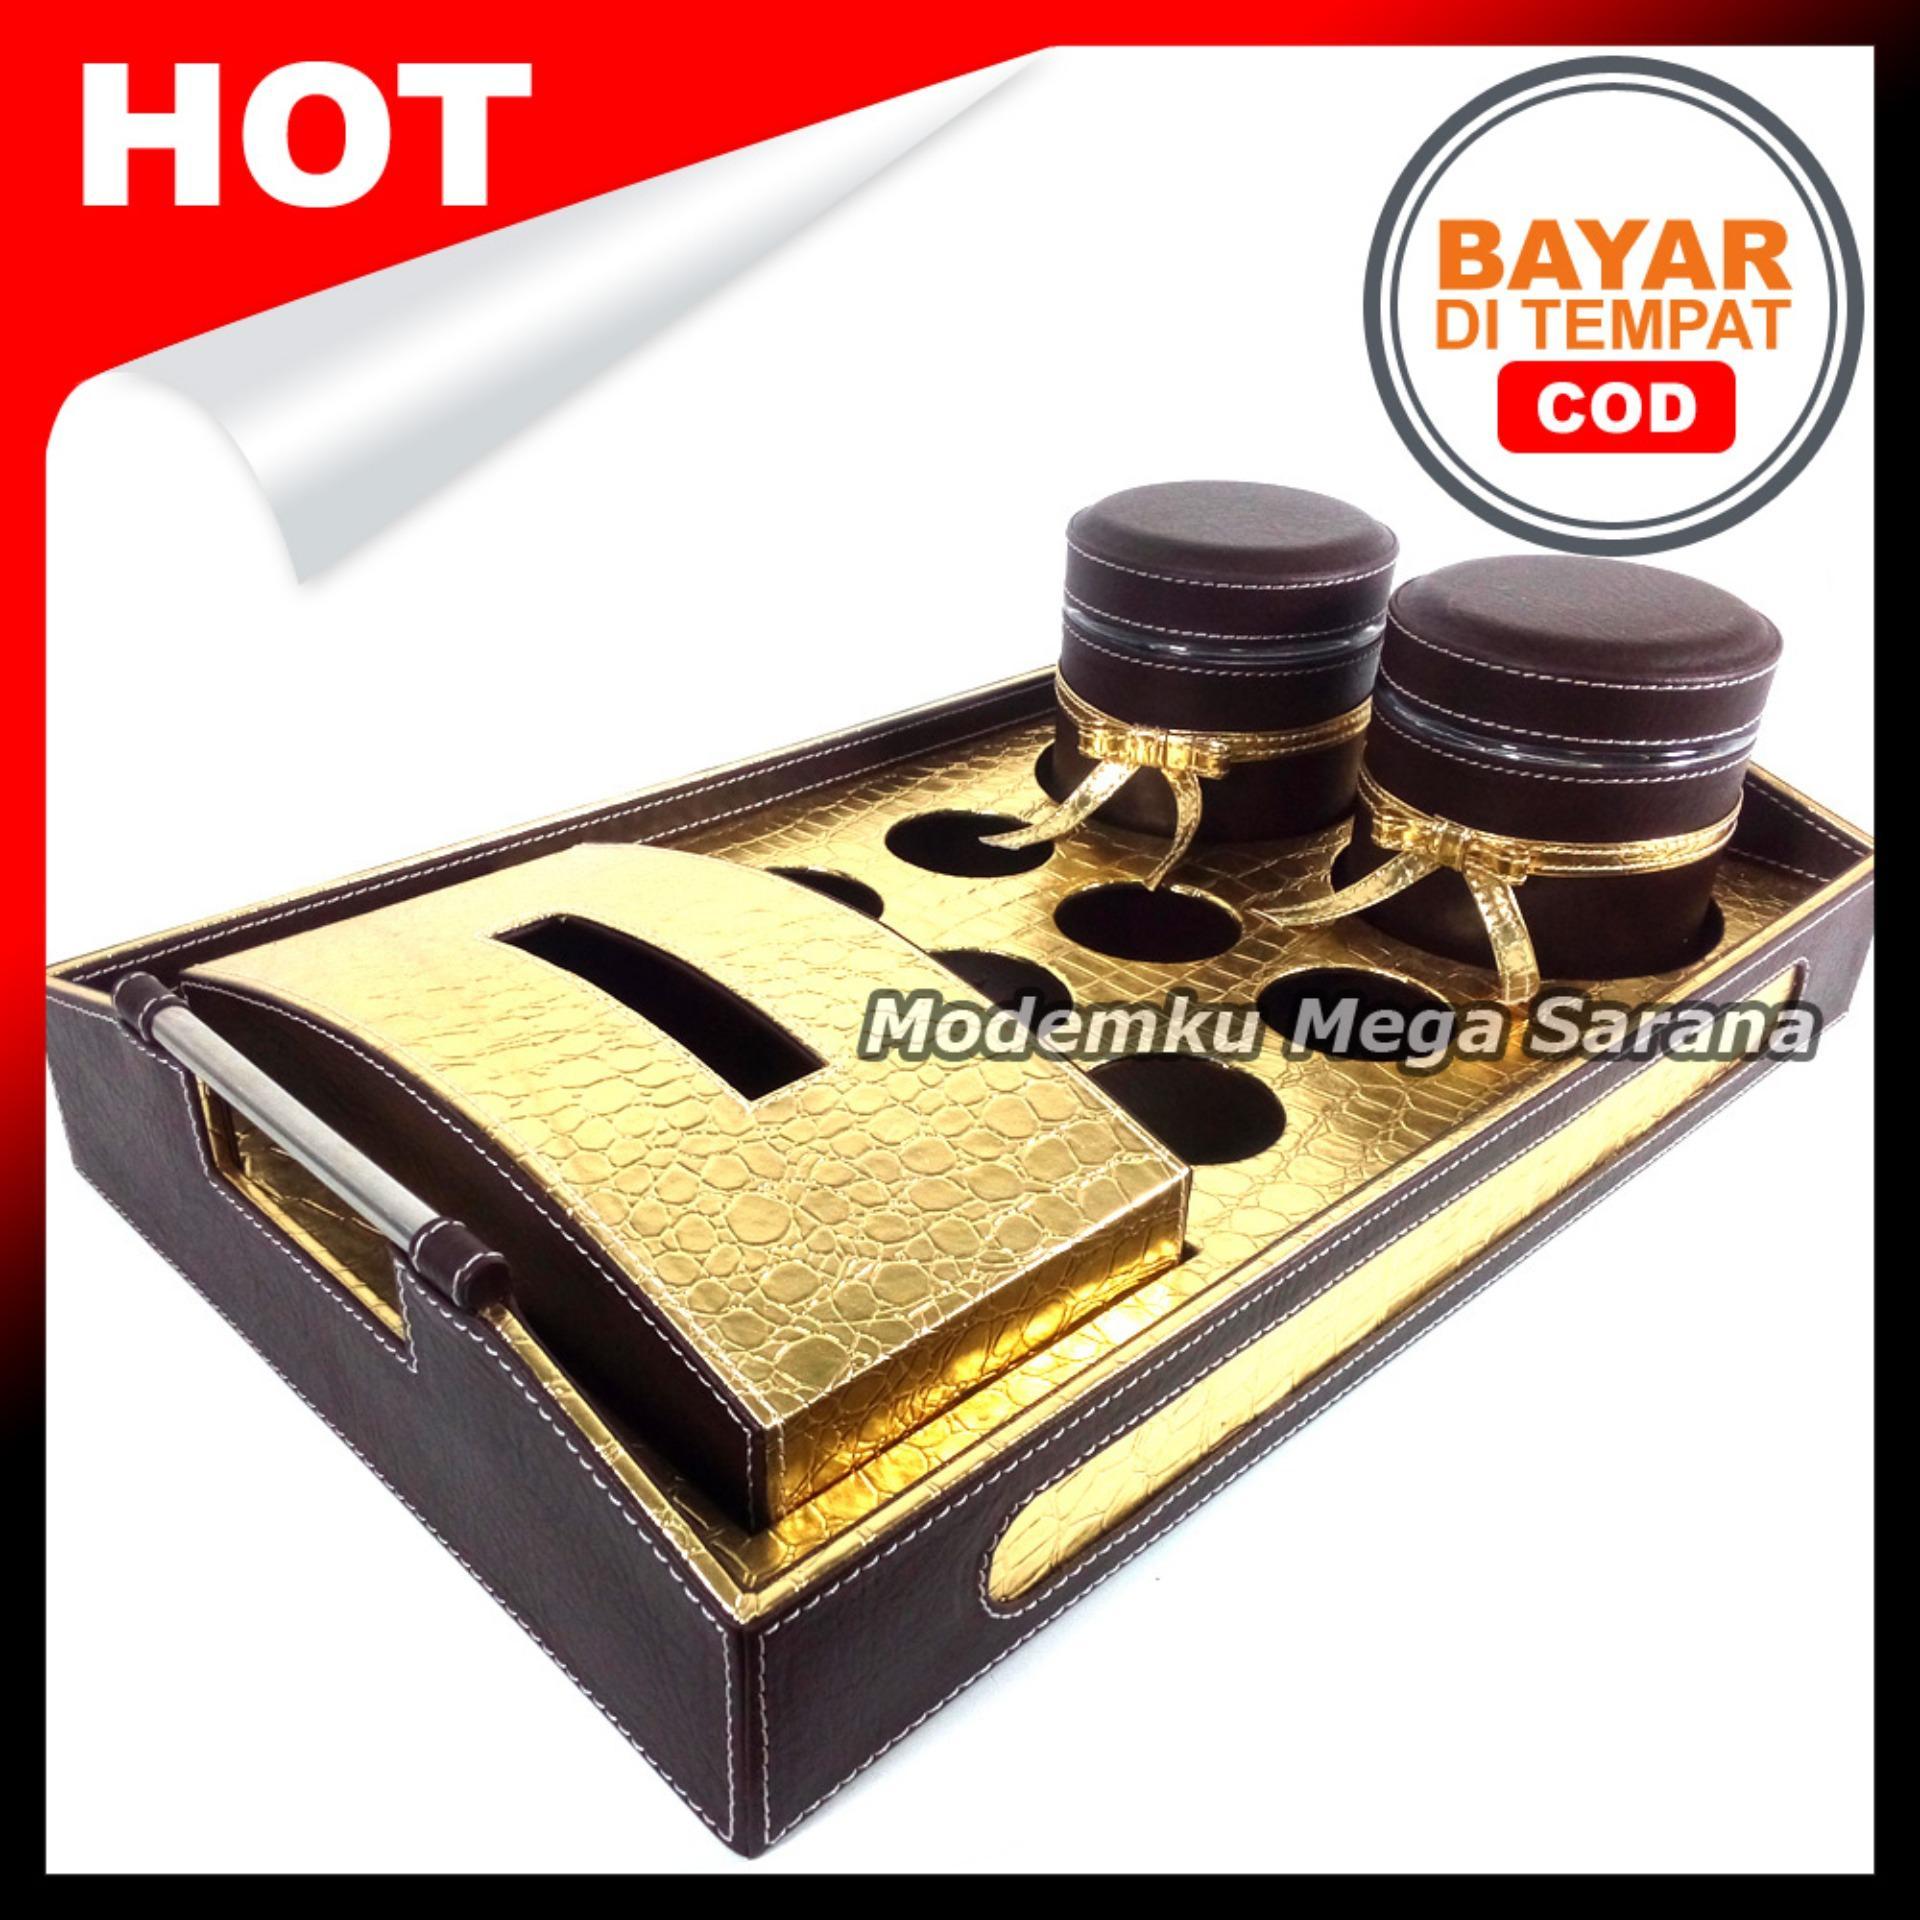 MMS - Tray Sett 3 in 1 - Coklat Emas 1 Tisu 2 Toples 6 Lubang